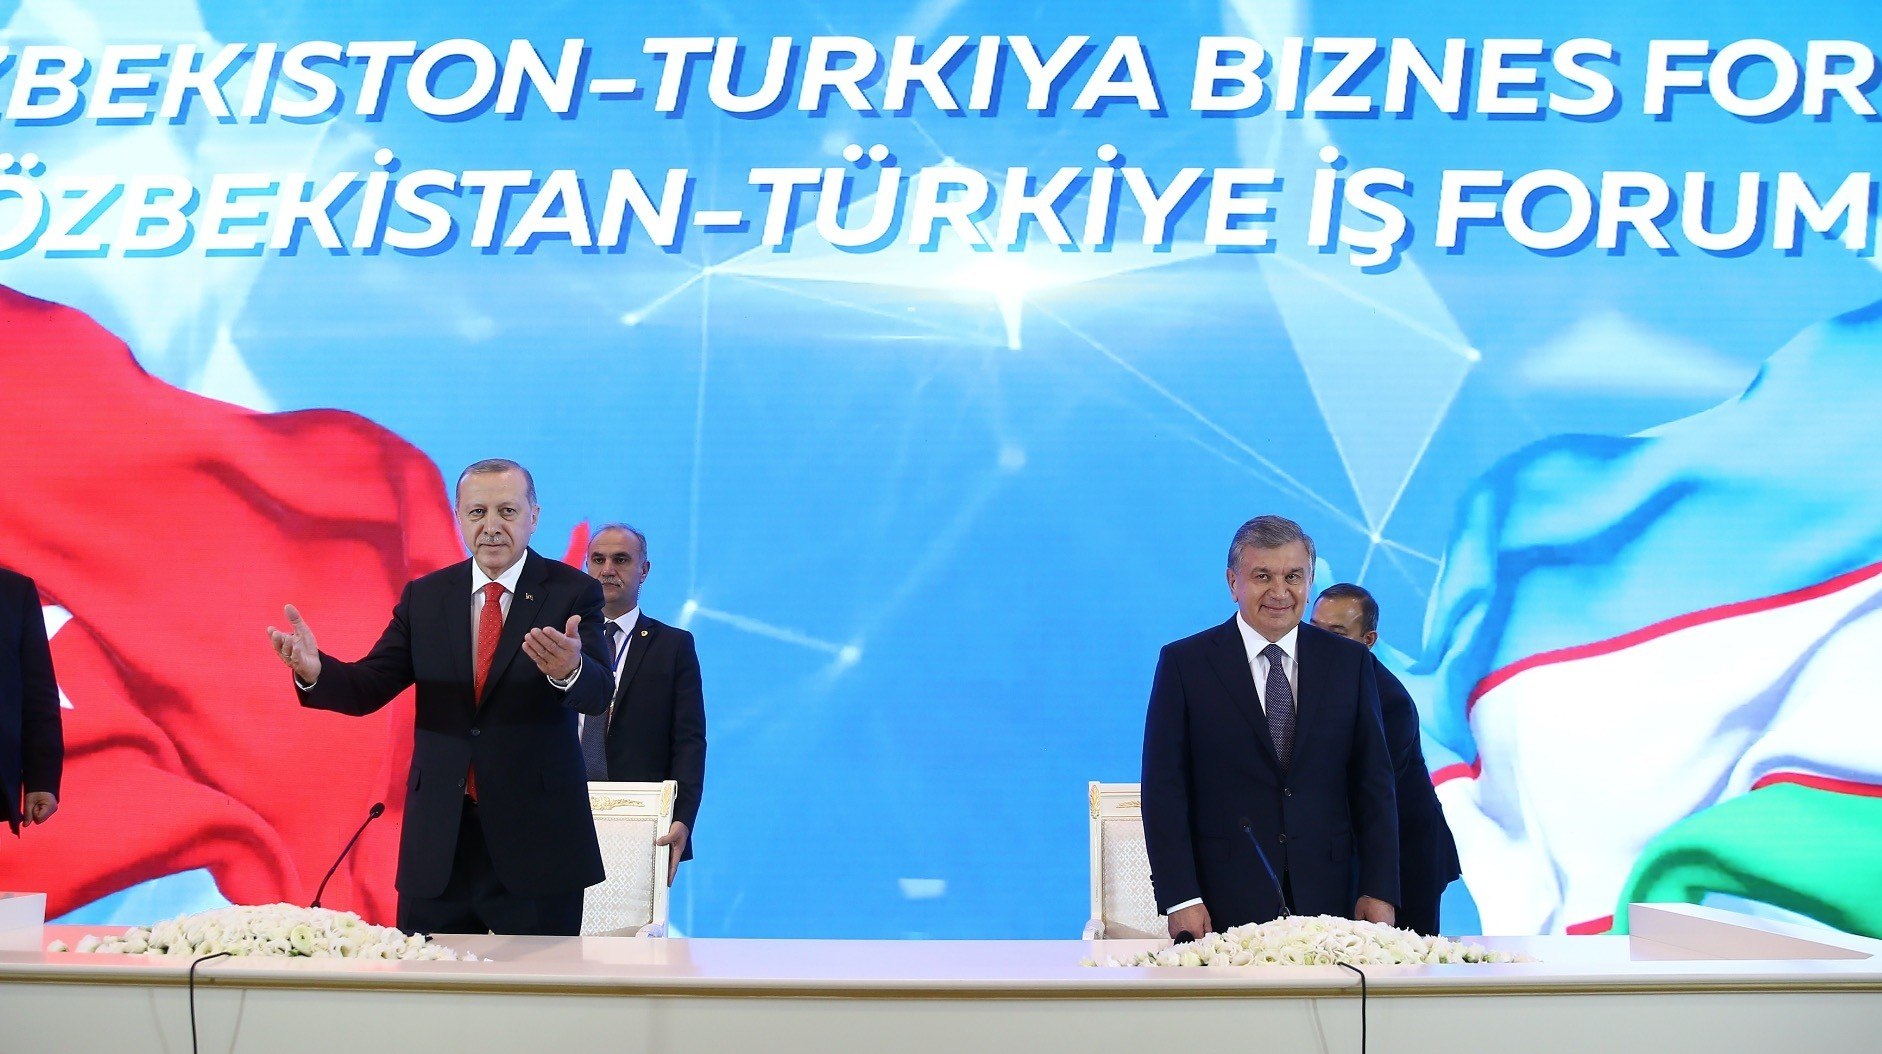 President Erdou011fan (L) and Uzbekistan President Mirziyoyev delivered speech at the Turkey-Uzbekistan Business Forum, Tashkent, April 30.